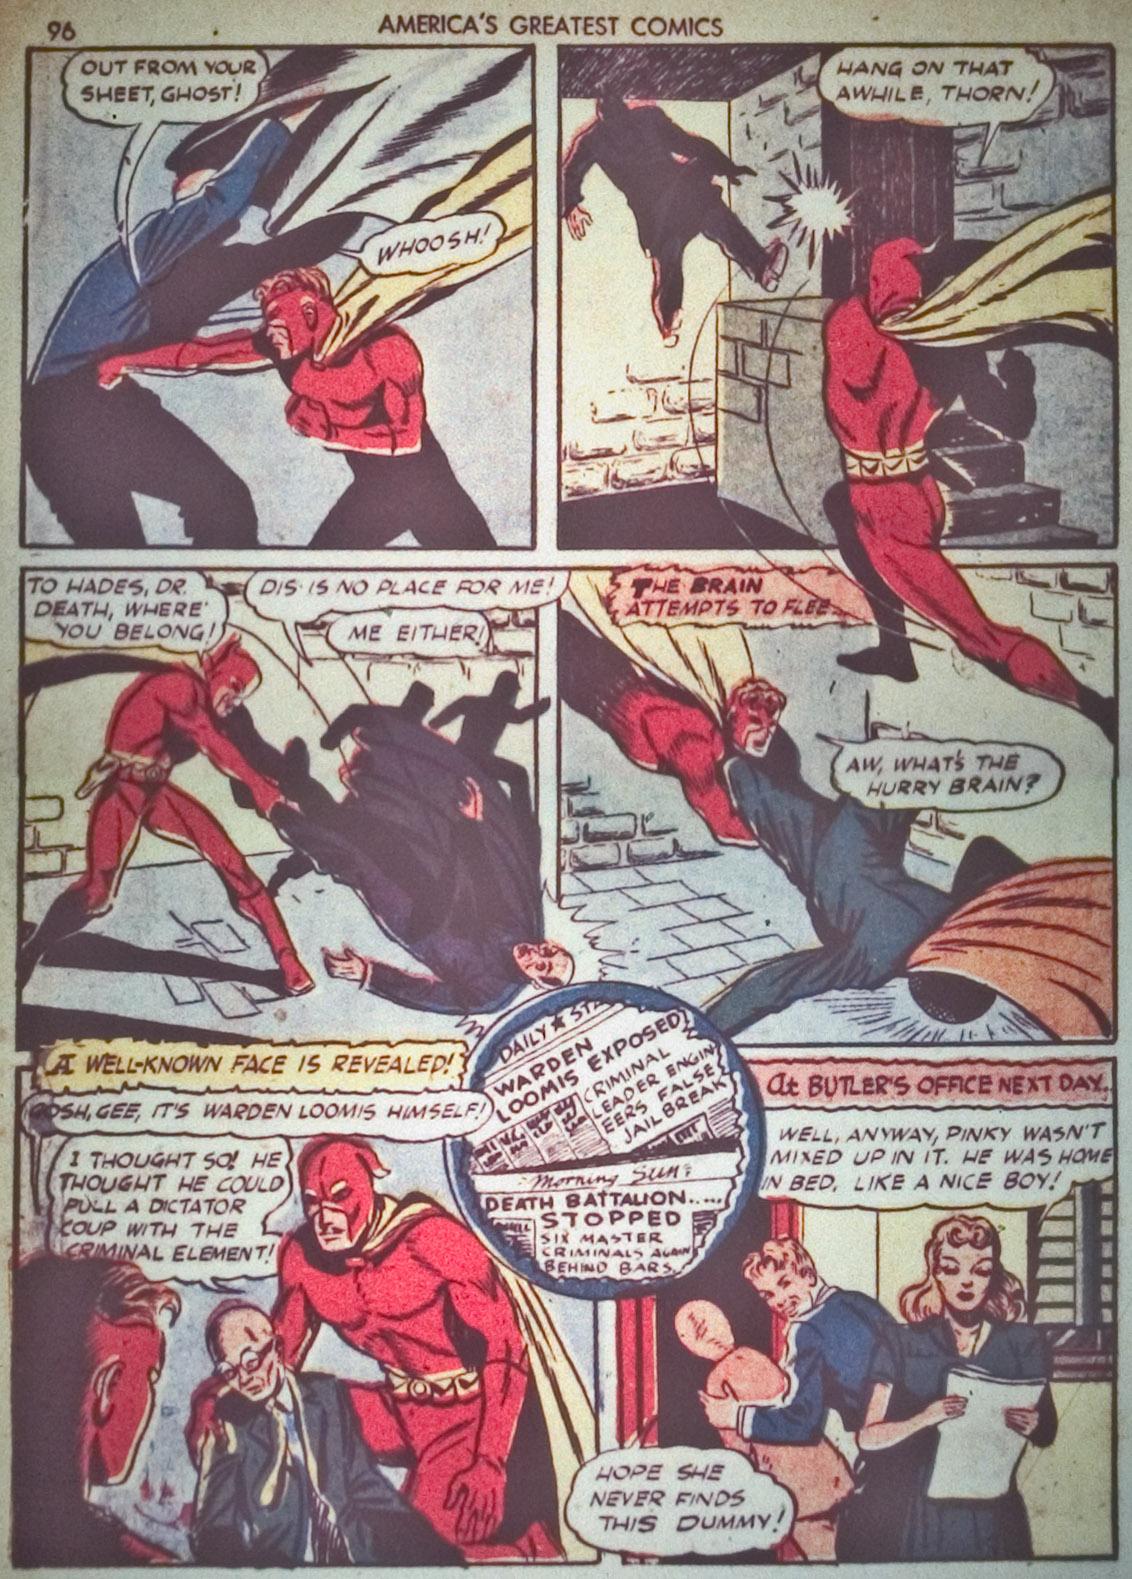 Read online America's Greatest Comics comic -  Issue #1 - 99